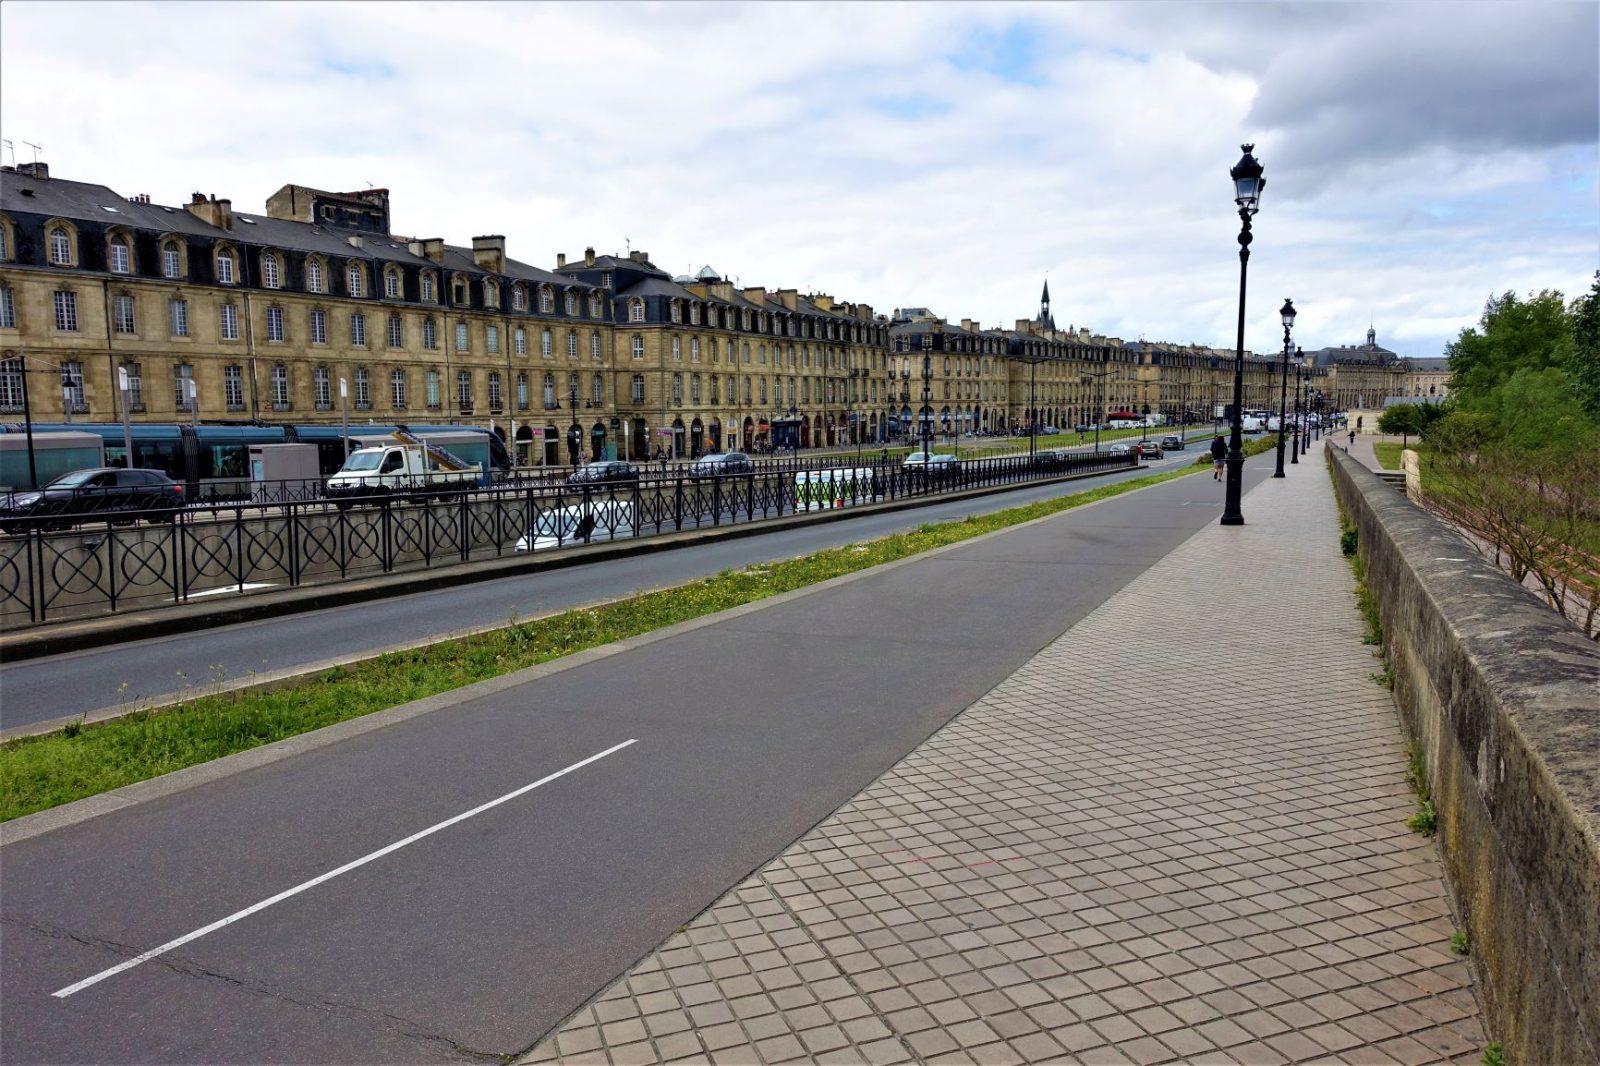 Tur langs kanalen i Bordeux